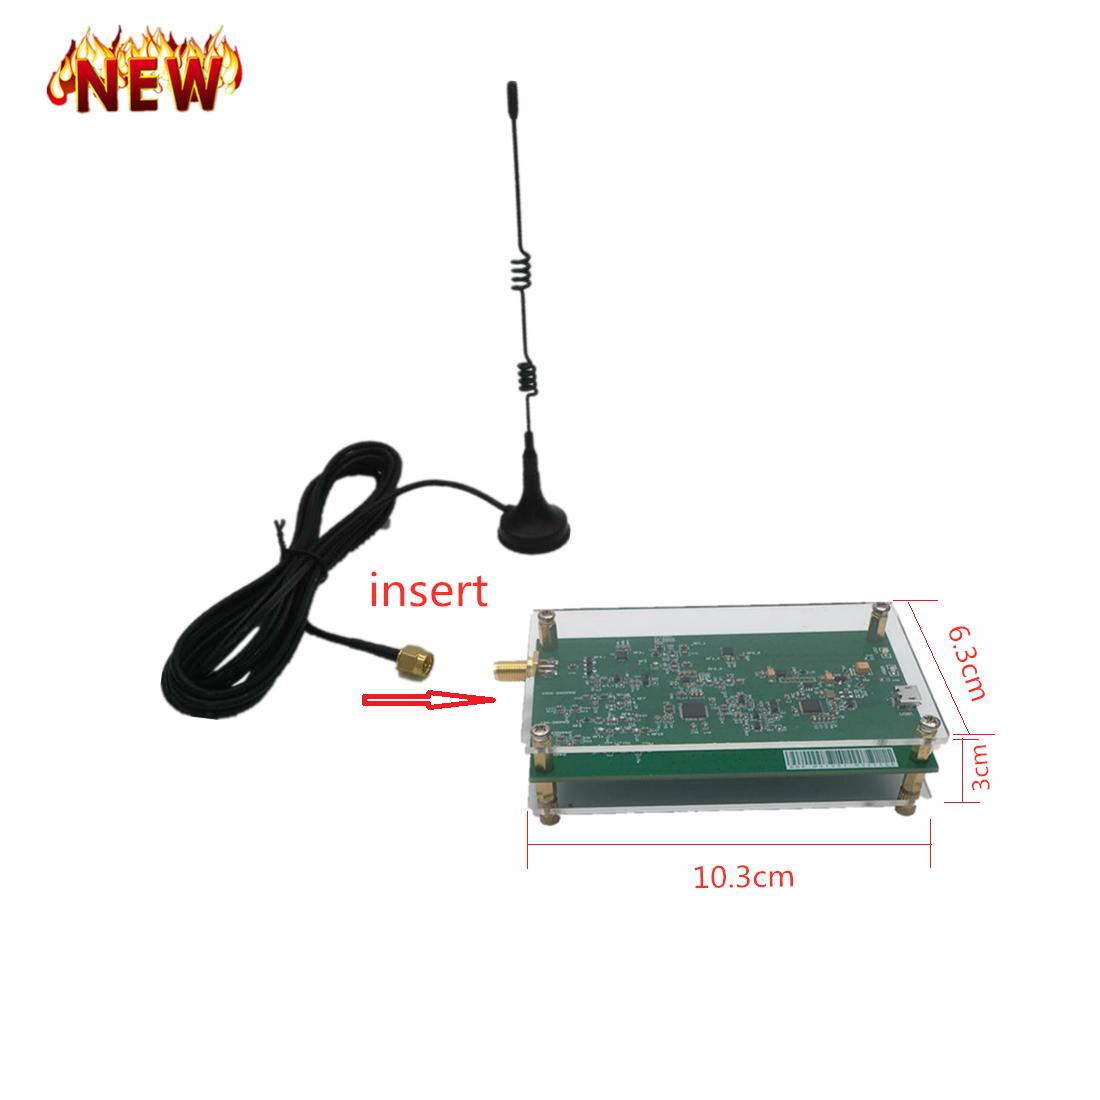 Receptor SDRPLAY RSP1 RSP2 RTL-SDR 10 KHz-2 GHz función completa 12 bits